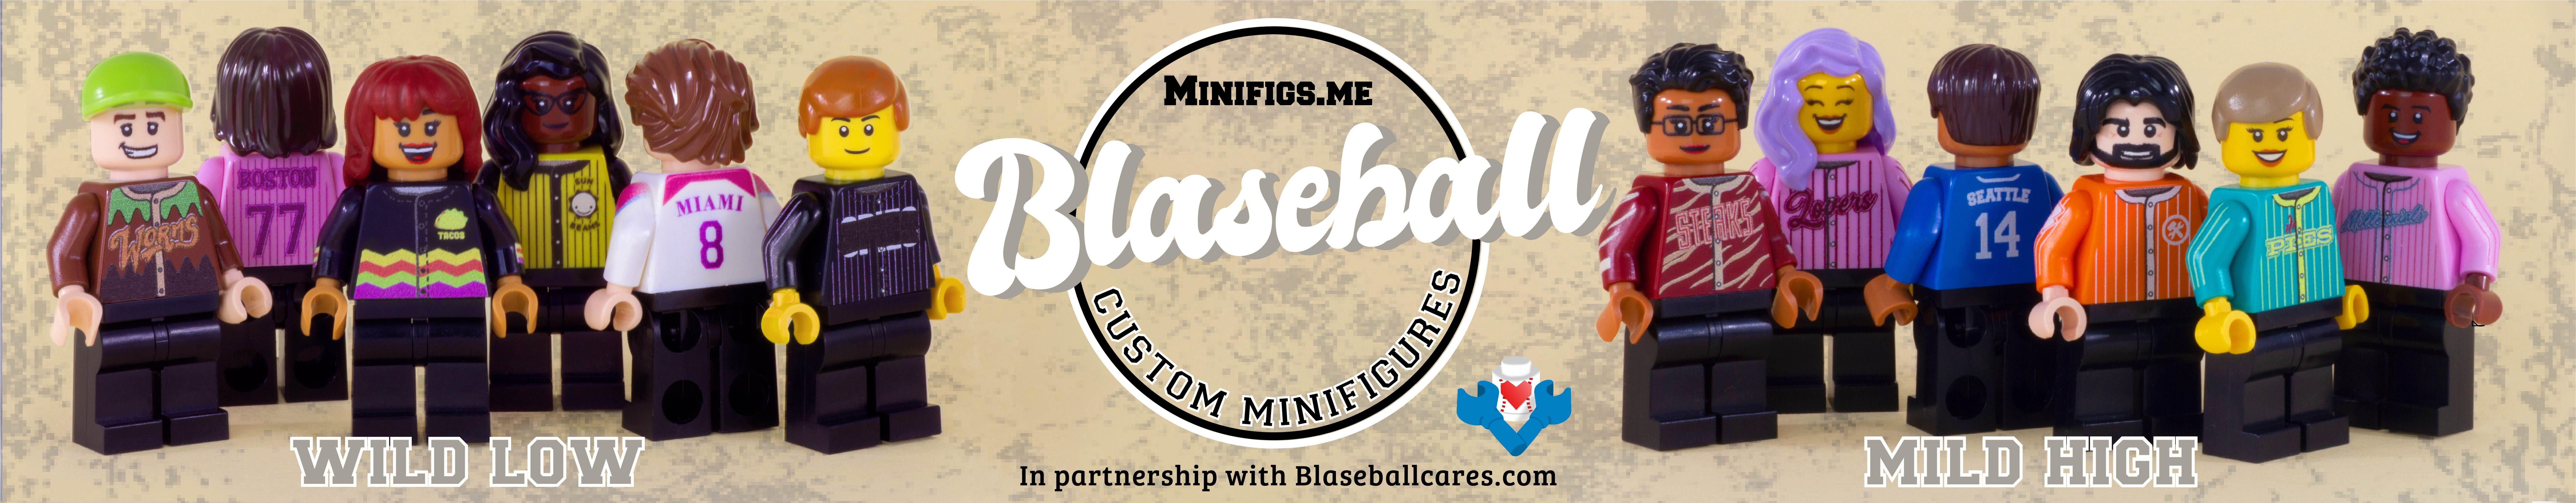 Minifigs.me Blaseball Custom Minifigures, in partnership with Blaseball Cares